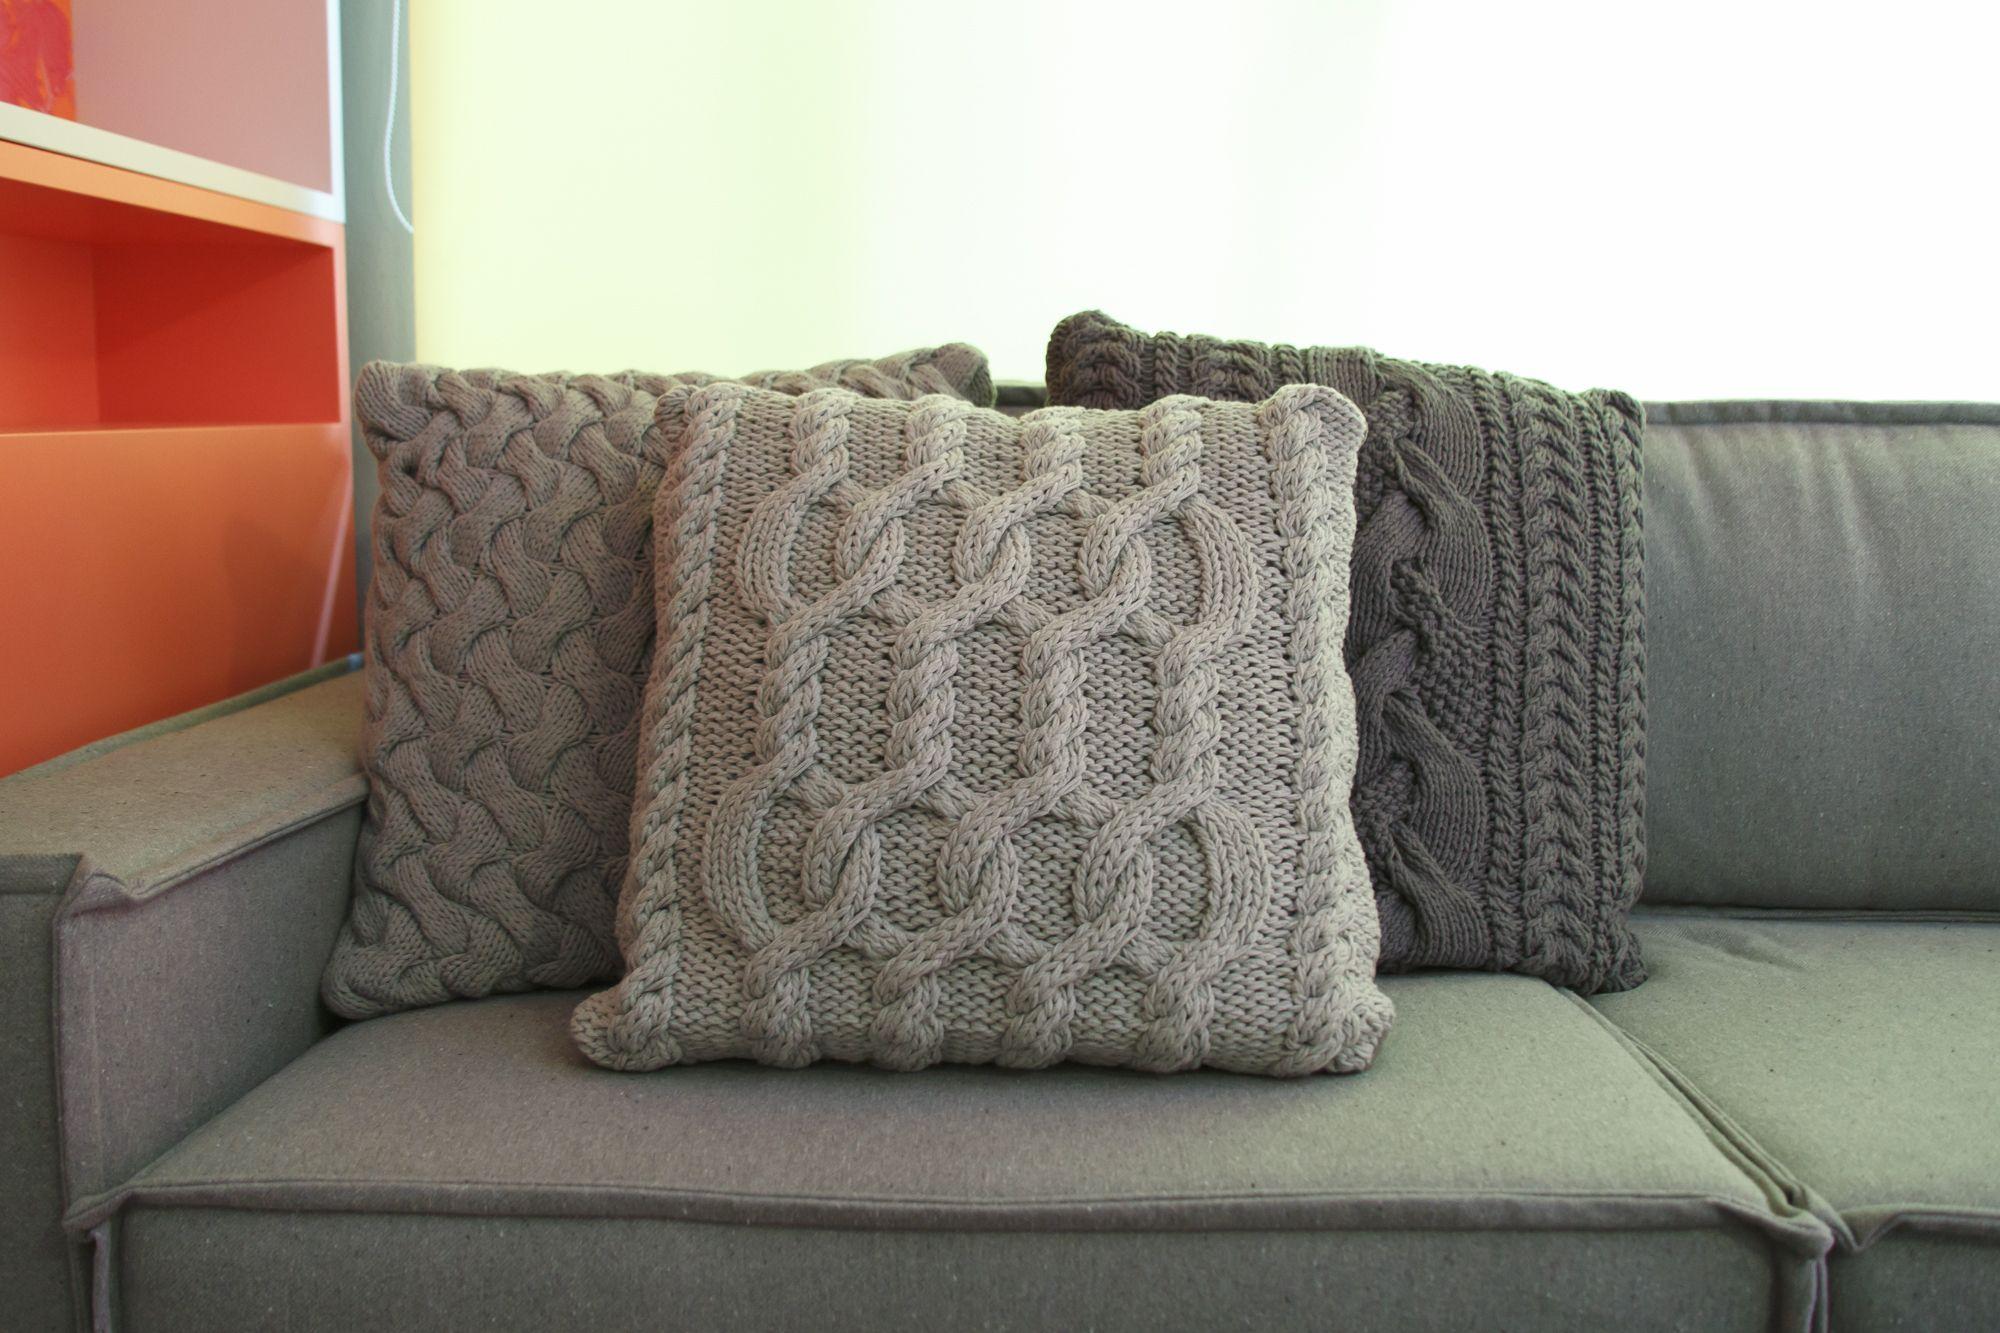 sofa cinza e almofadas coloridas corey chocolate brown sectional decora rosenbaum temporada 2 sala de diva sofá